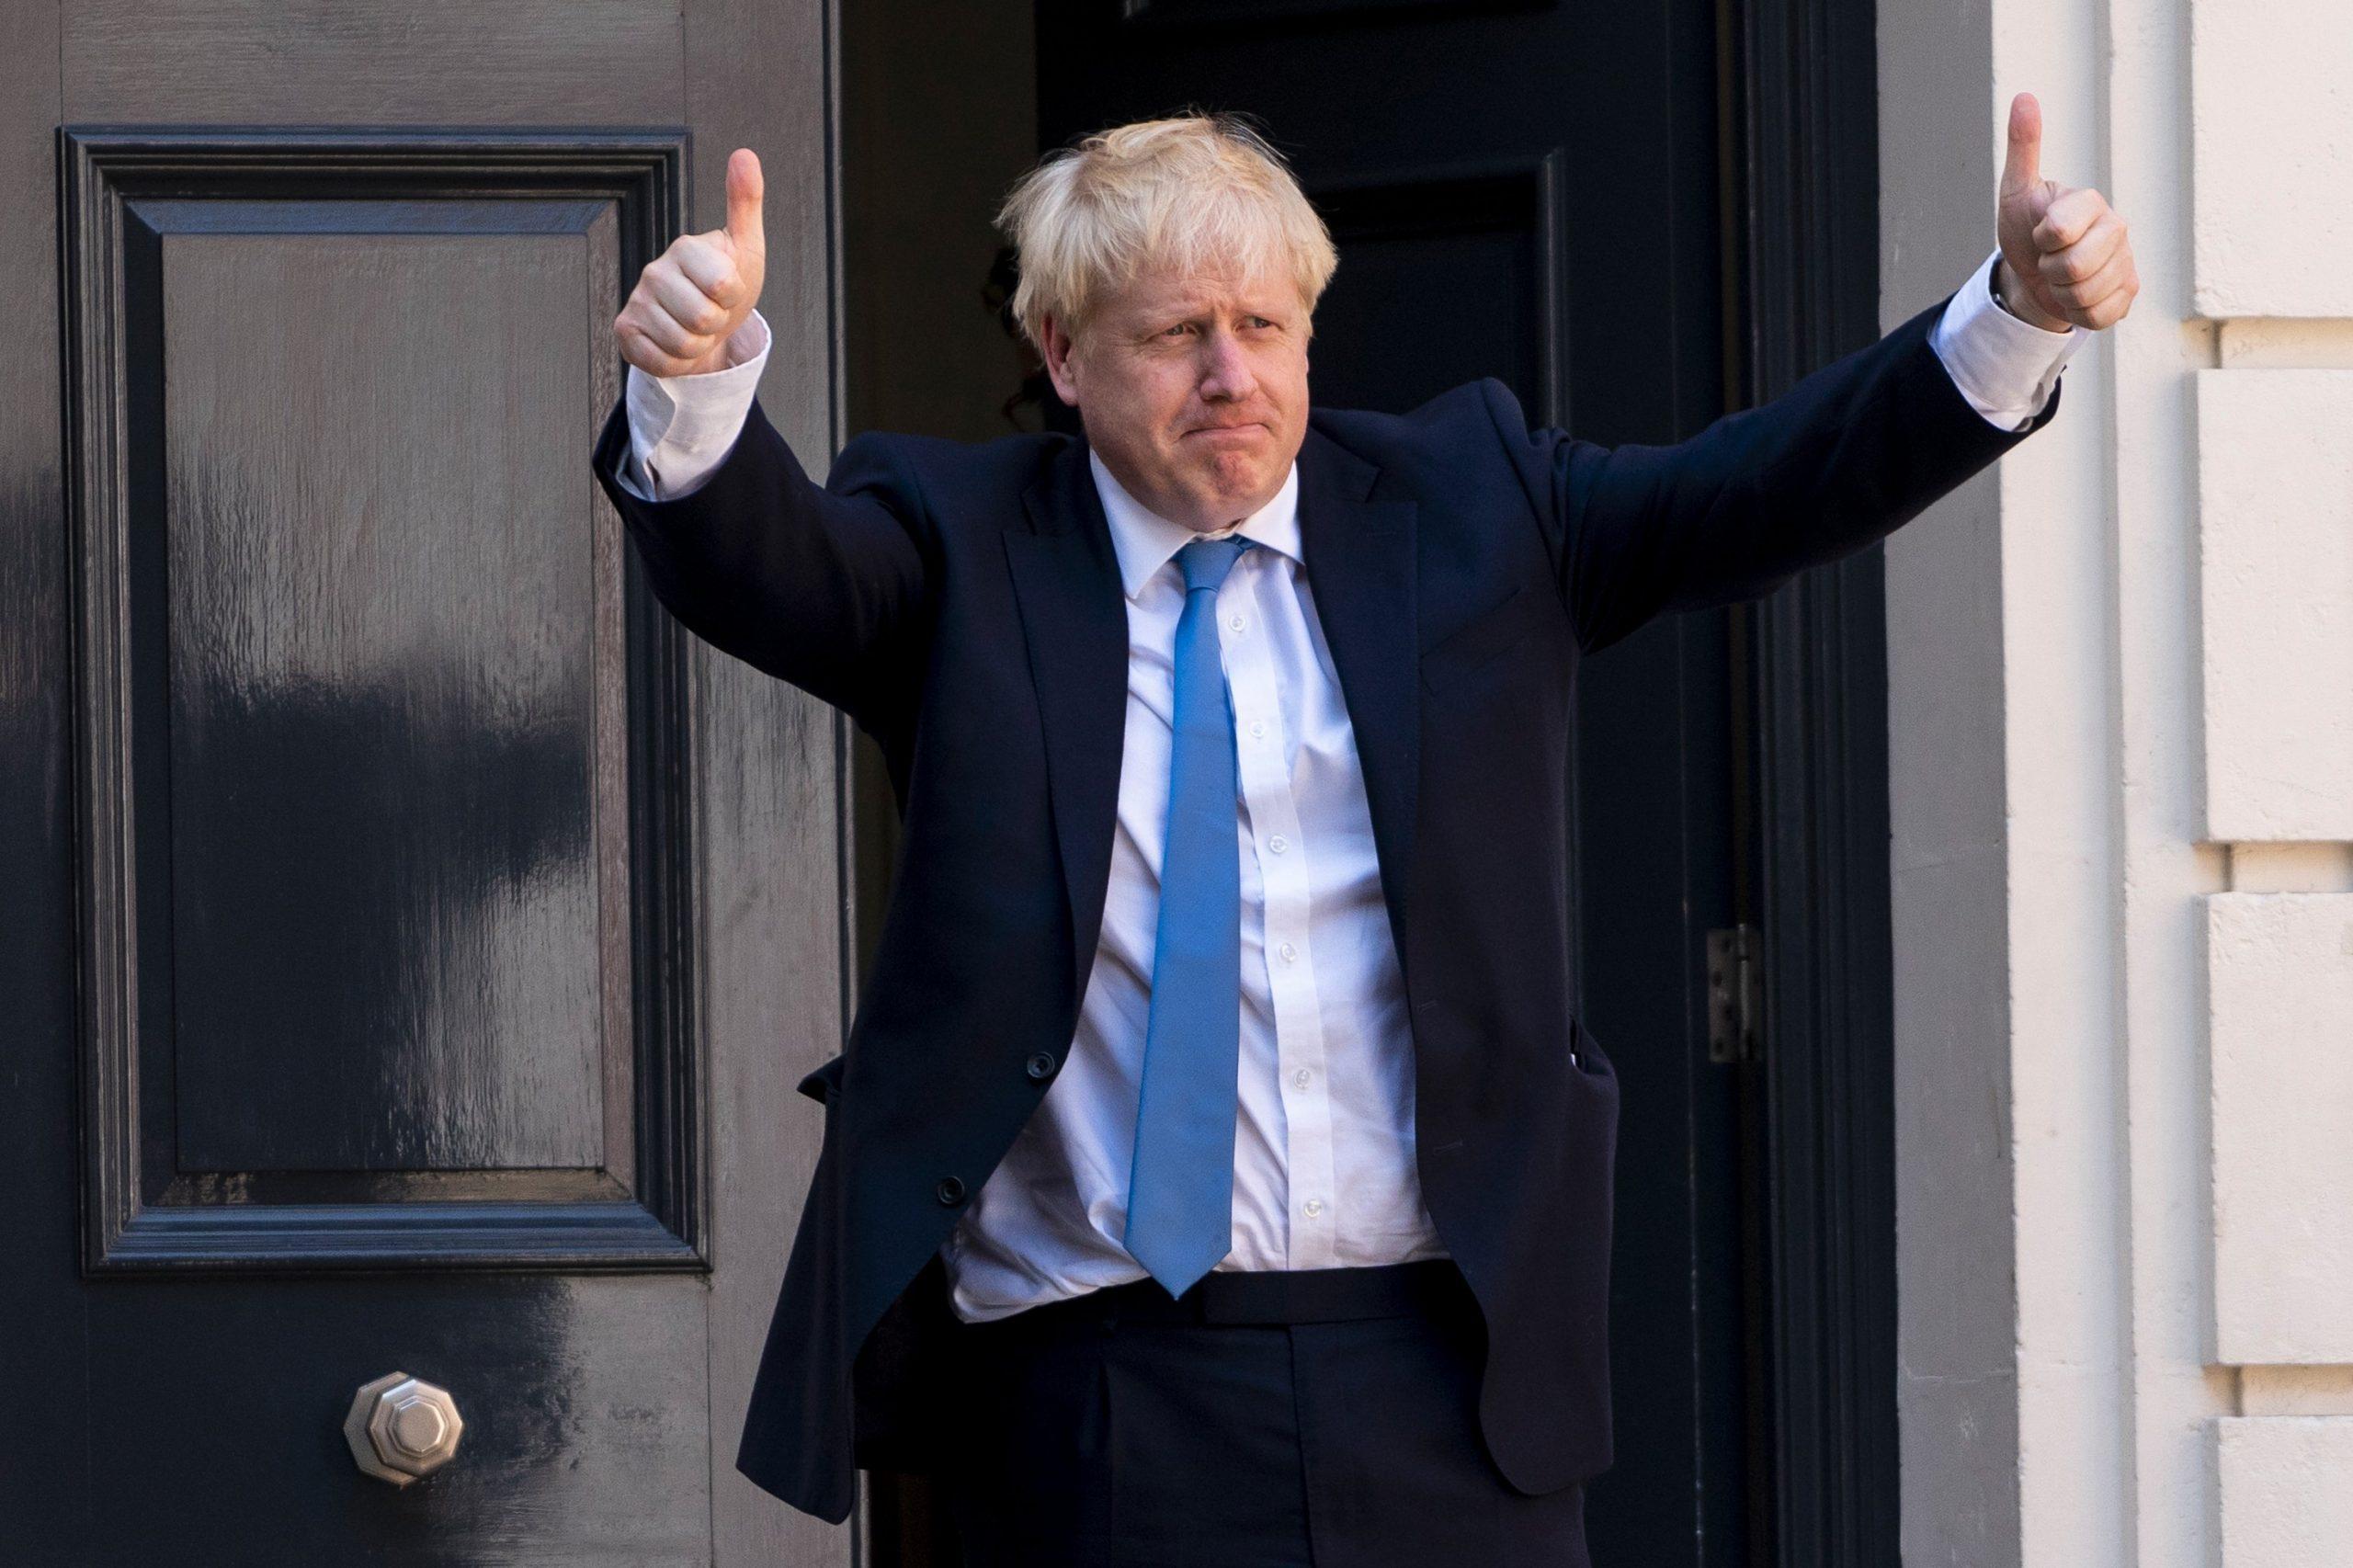 UK's Boris Johnson wins historic victory in Brexit election